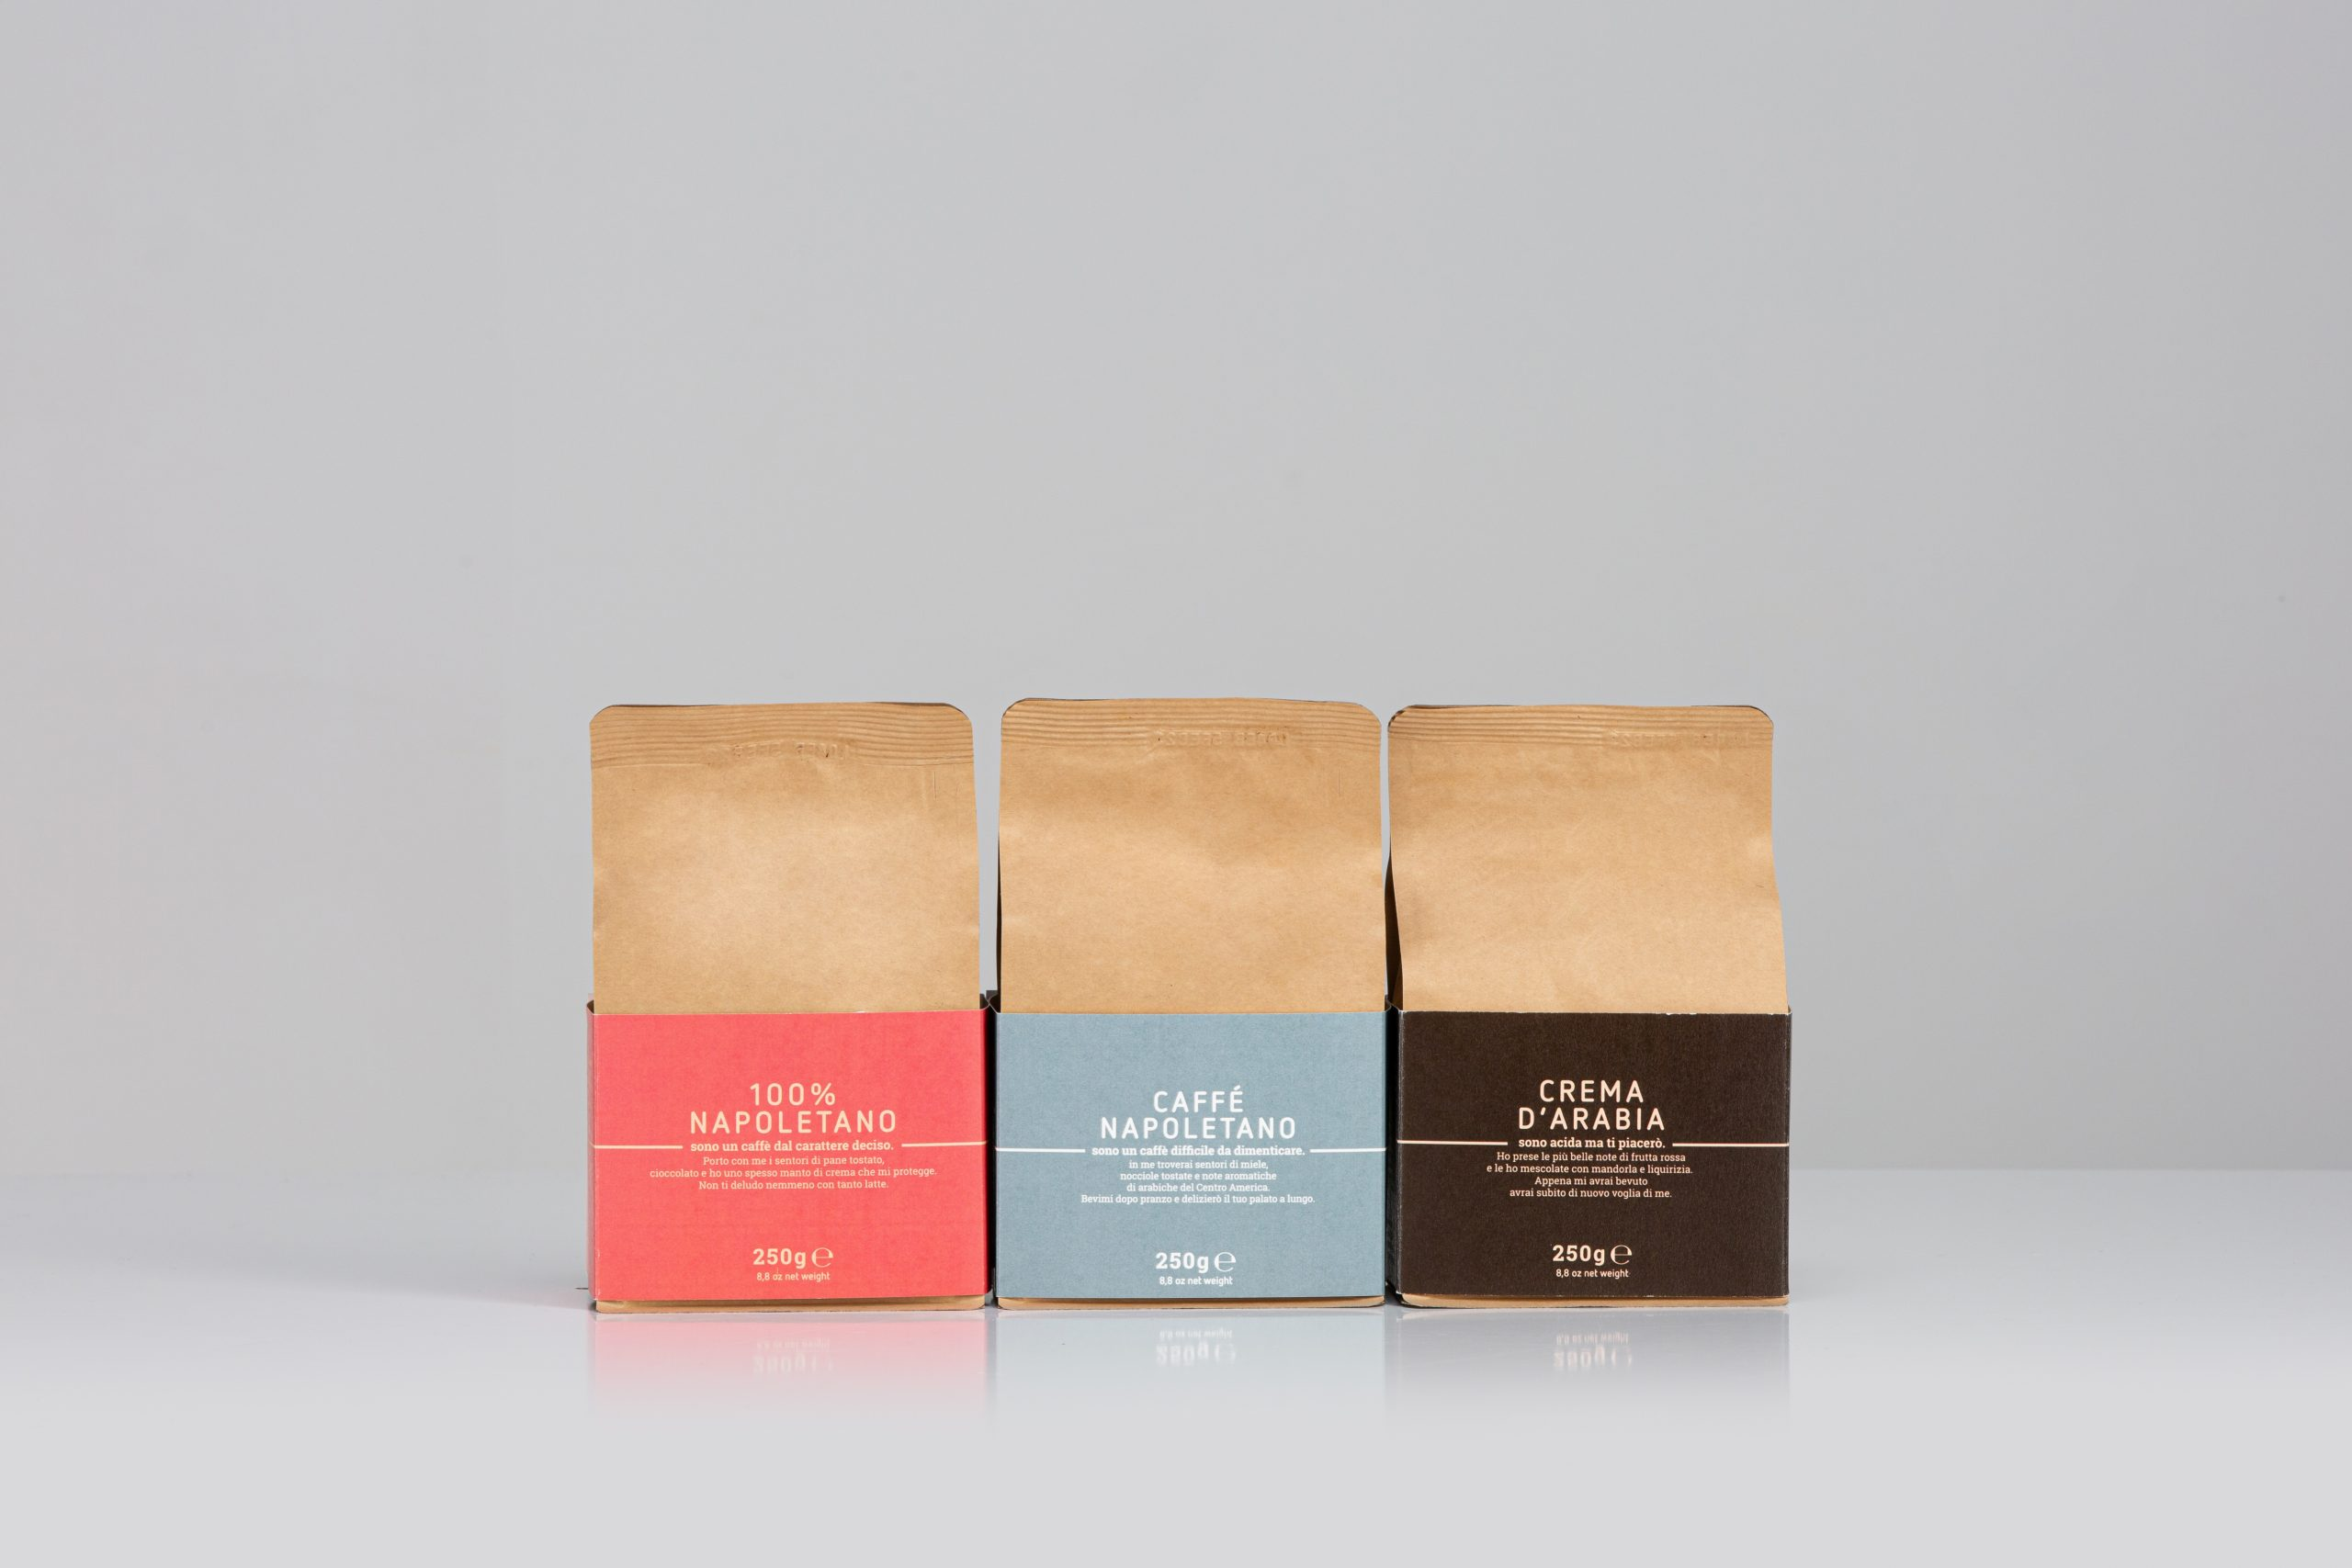 Nurri coffee blends napoletano arabia 250g